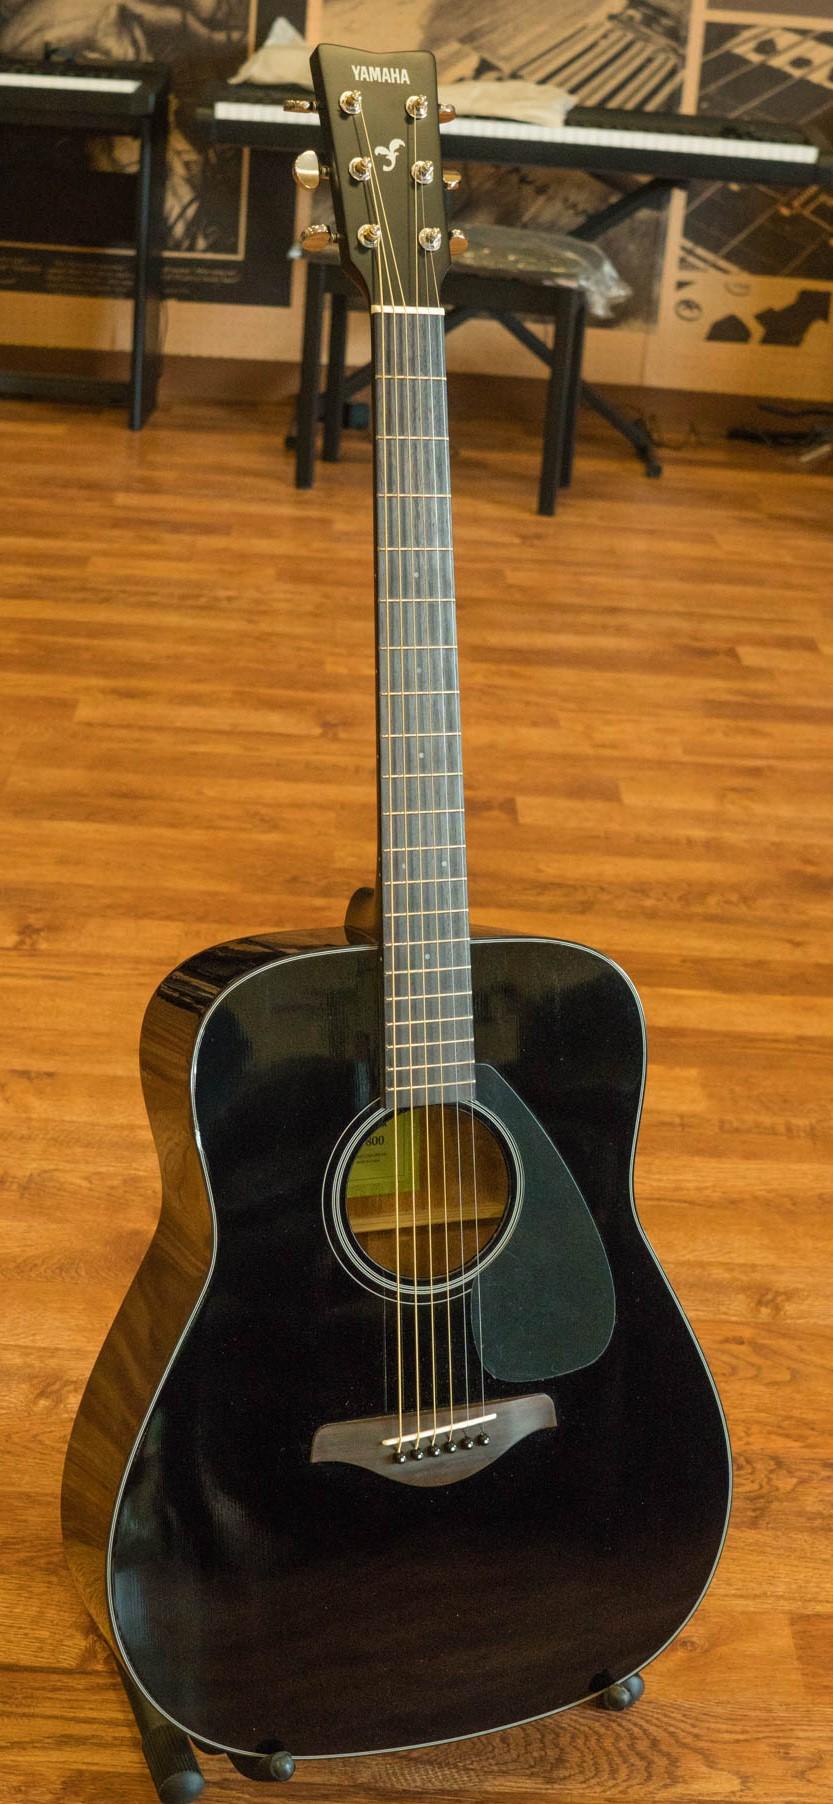 Product yamaha fg800 acoustic guitar black for Yamaha acoustic guitar ebay